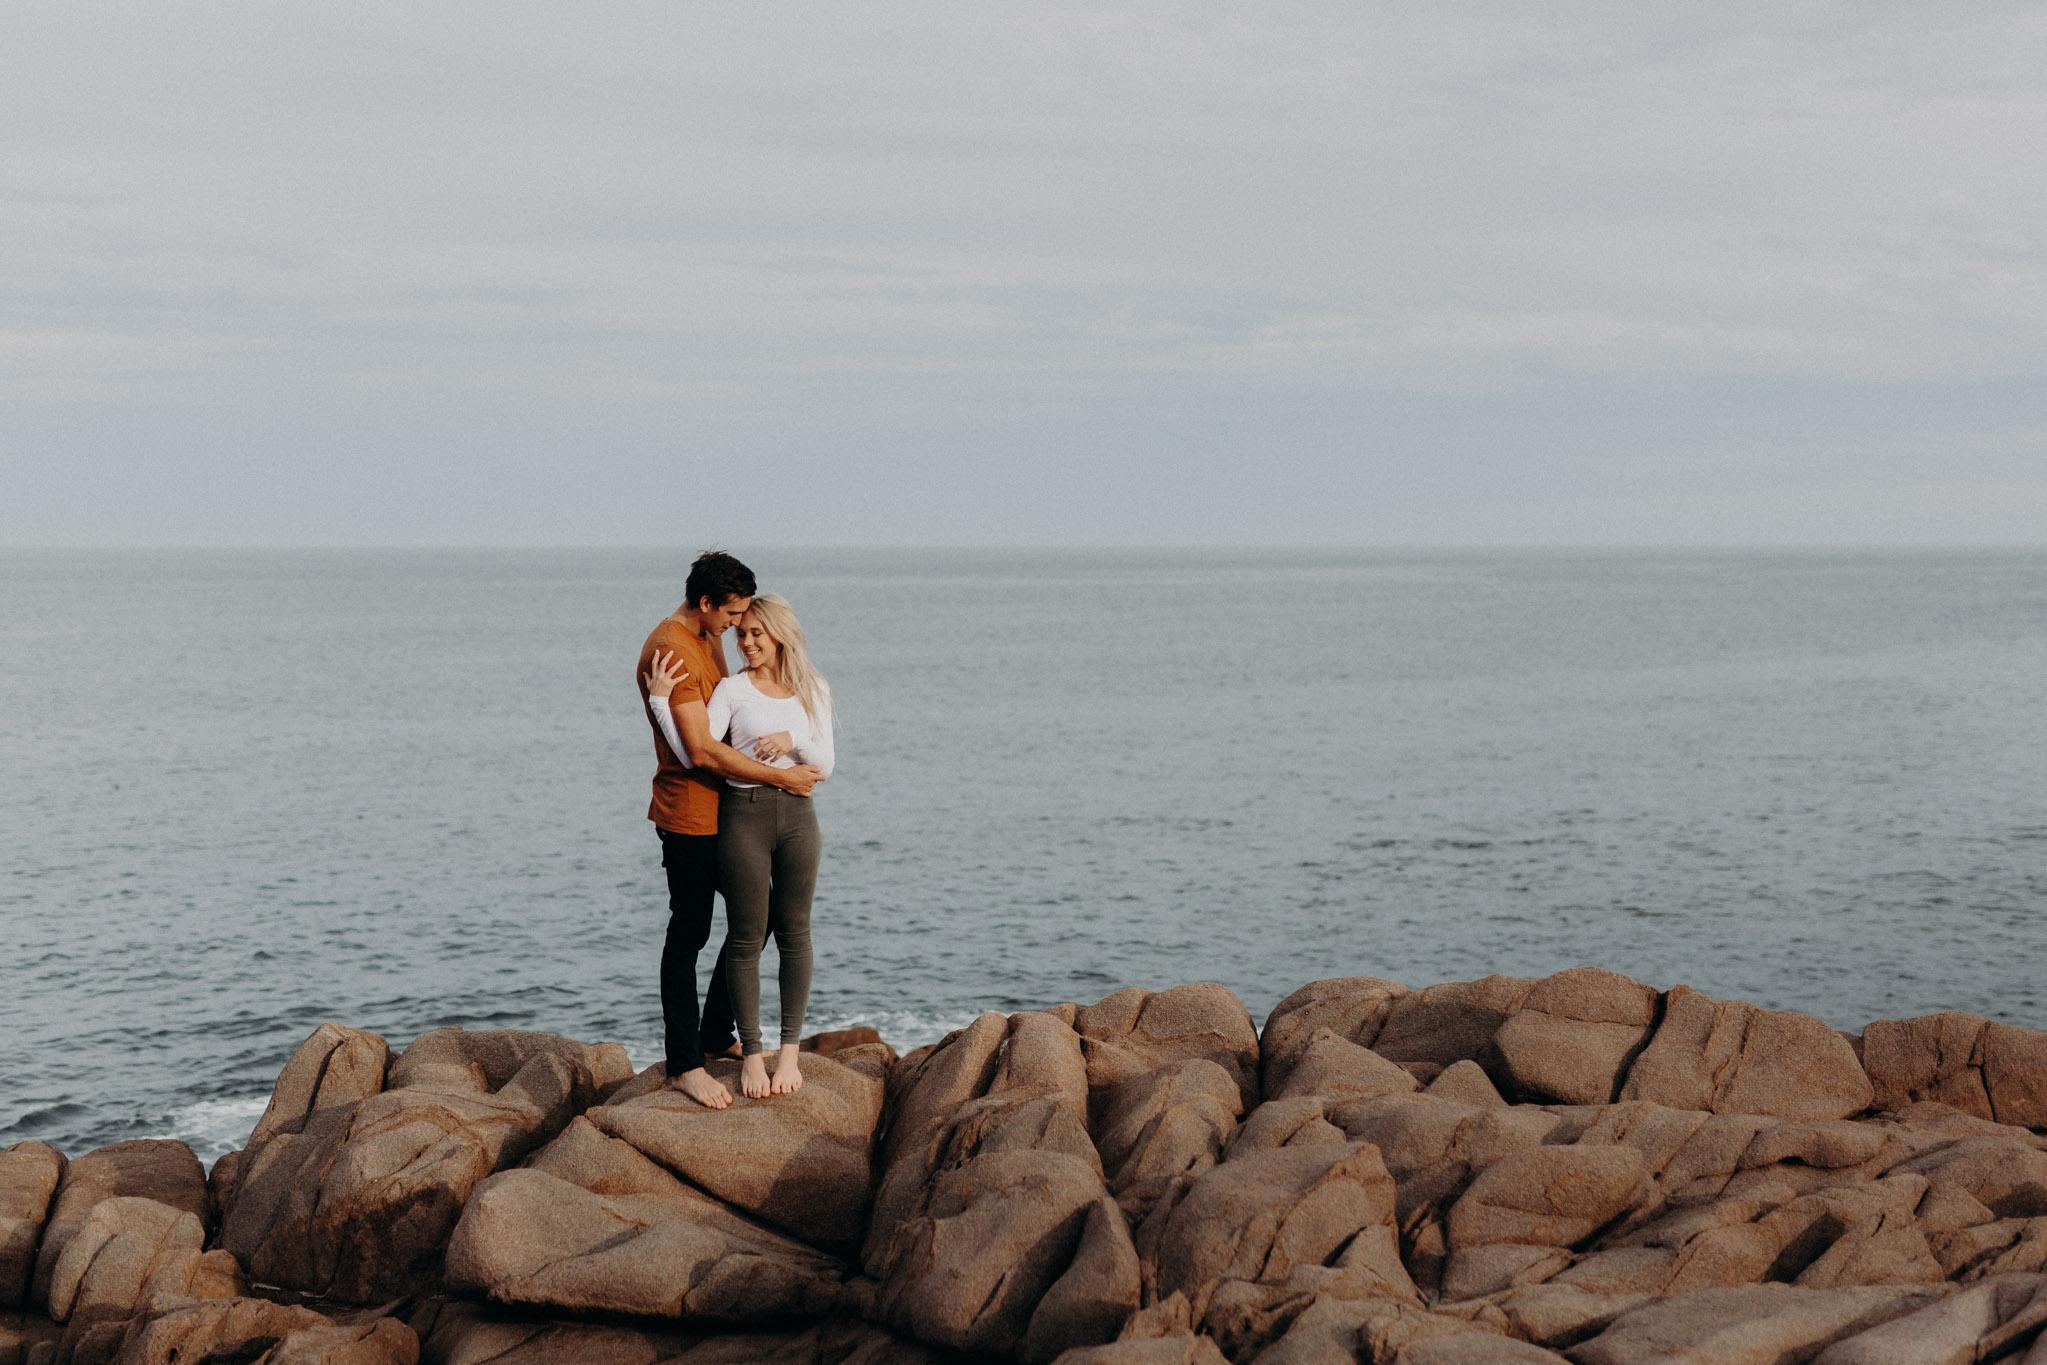 Stockton Dunes, Newcastle engagement session, canberra wedding photographer, bowral wedding photographer, southern highlands, engagement session, boho, natural, candid